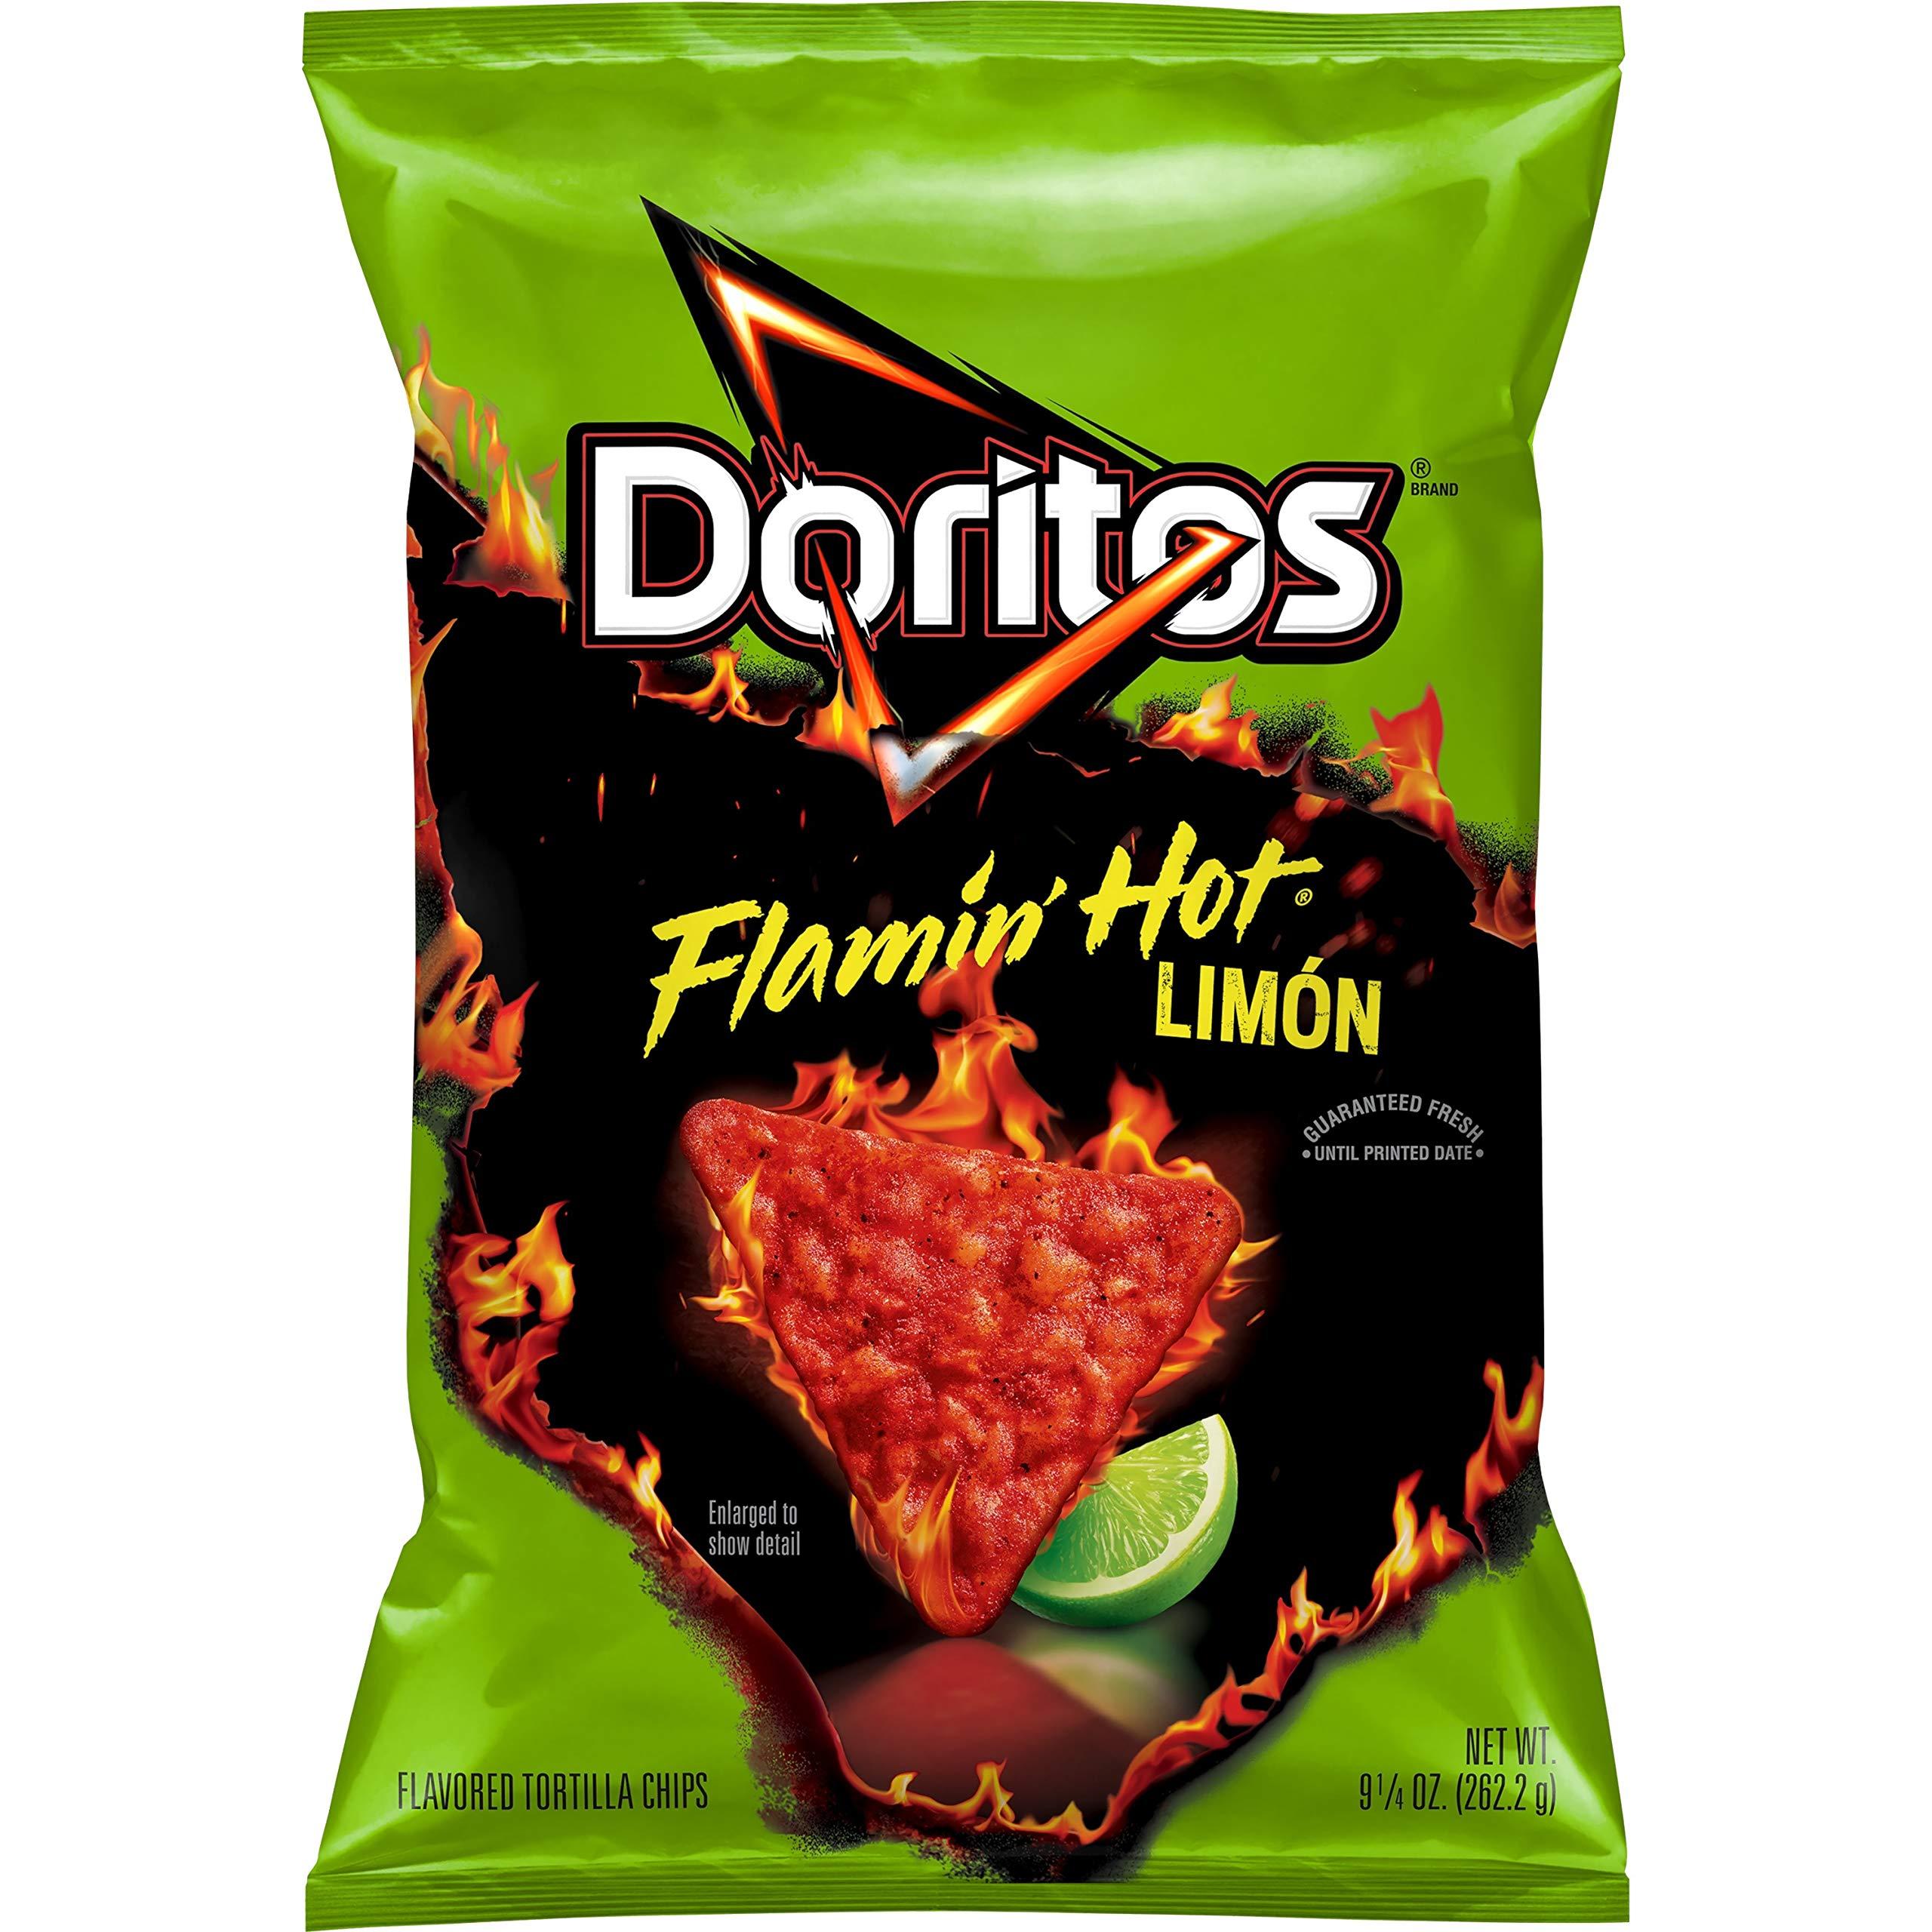 Doritos expiration date no year